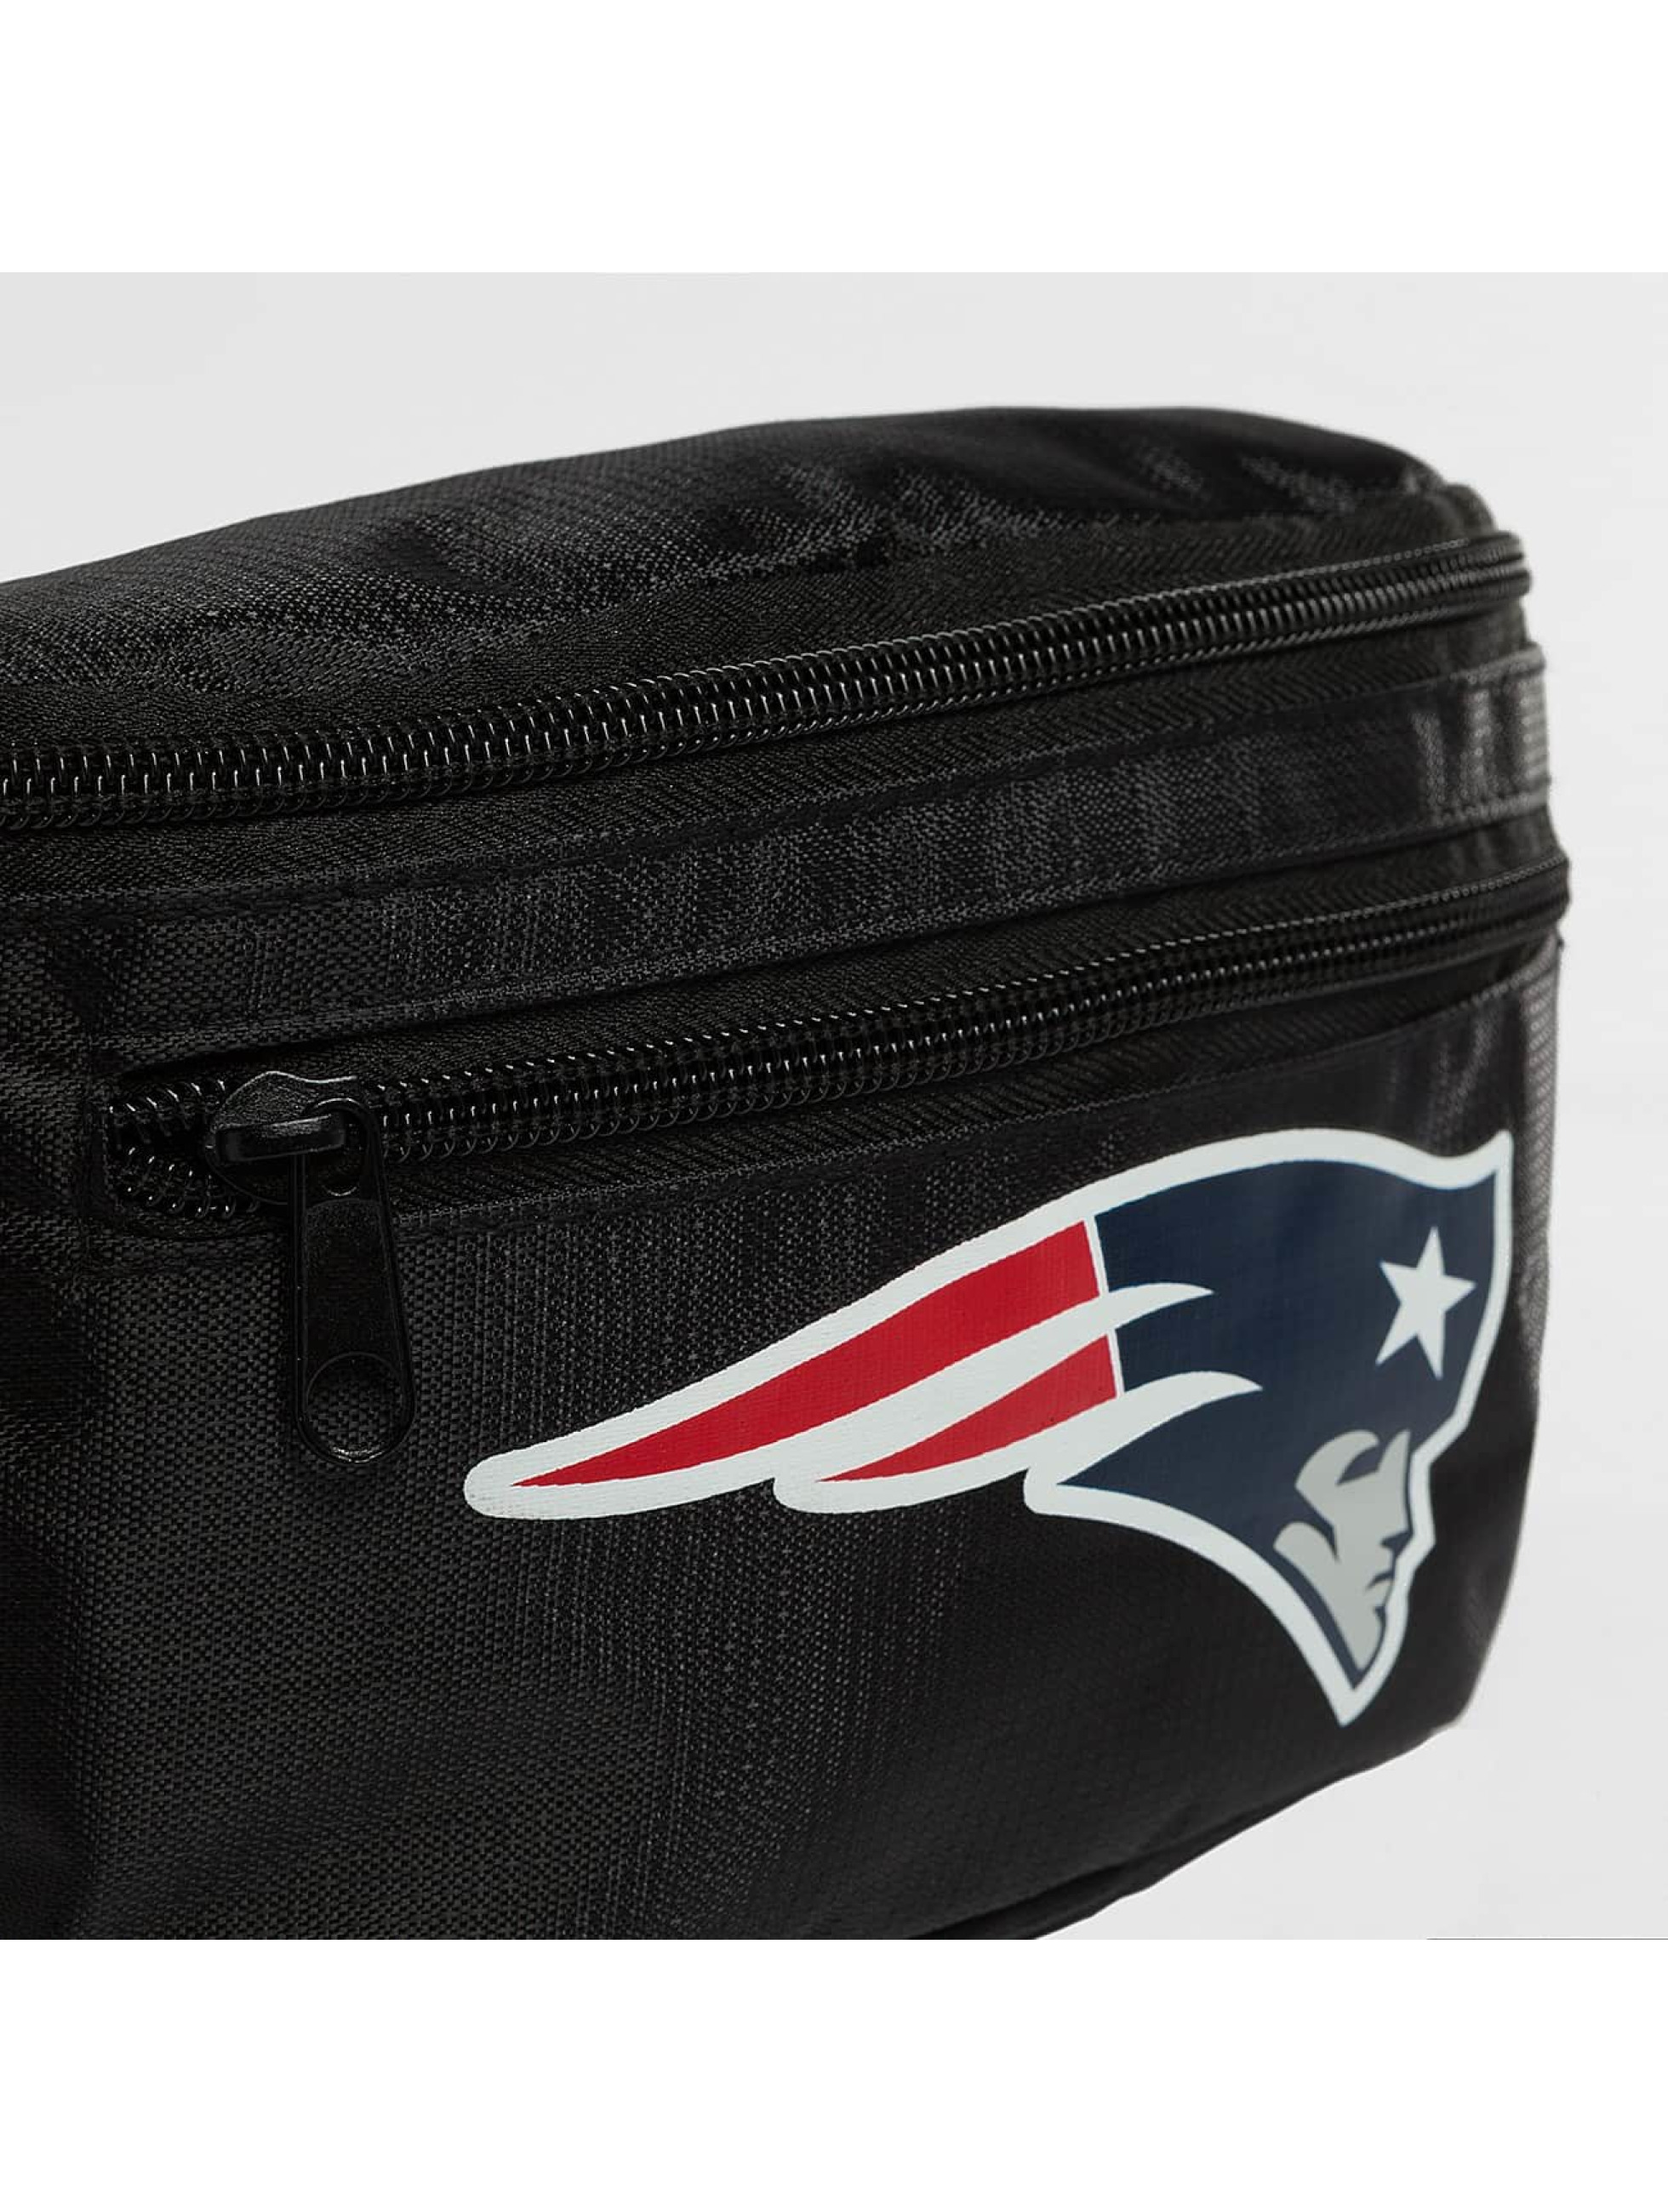 Forever Collectibles Tasche NFL New England Patriots schwarz